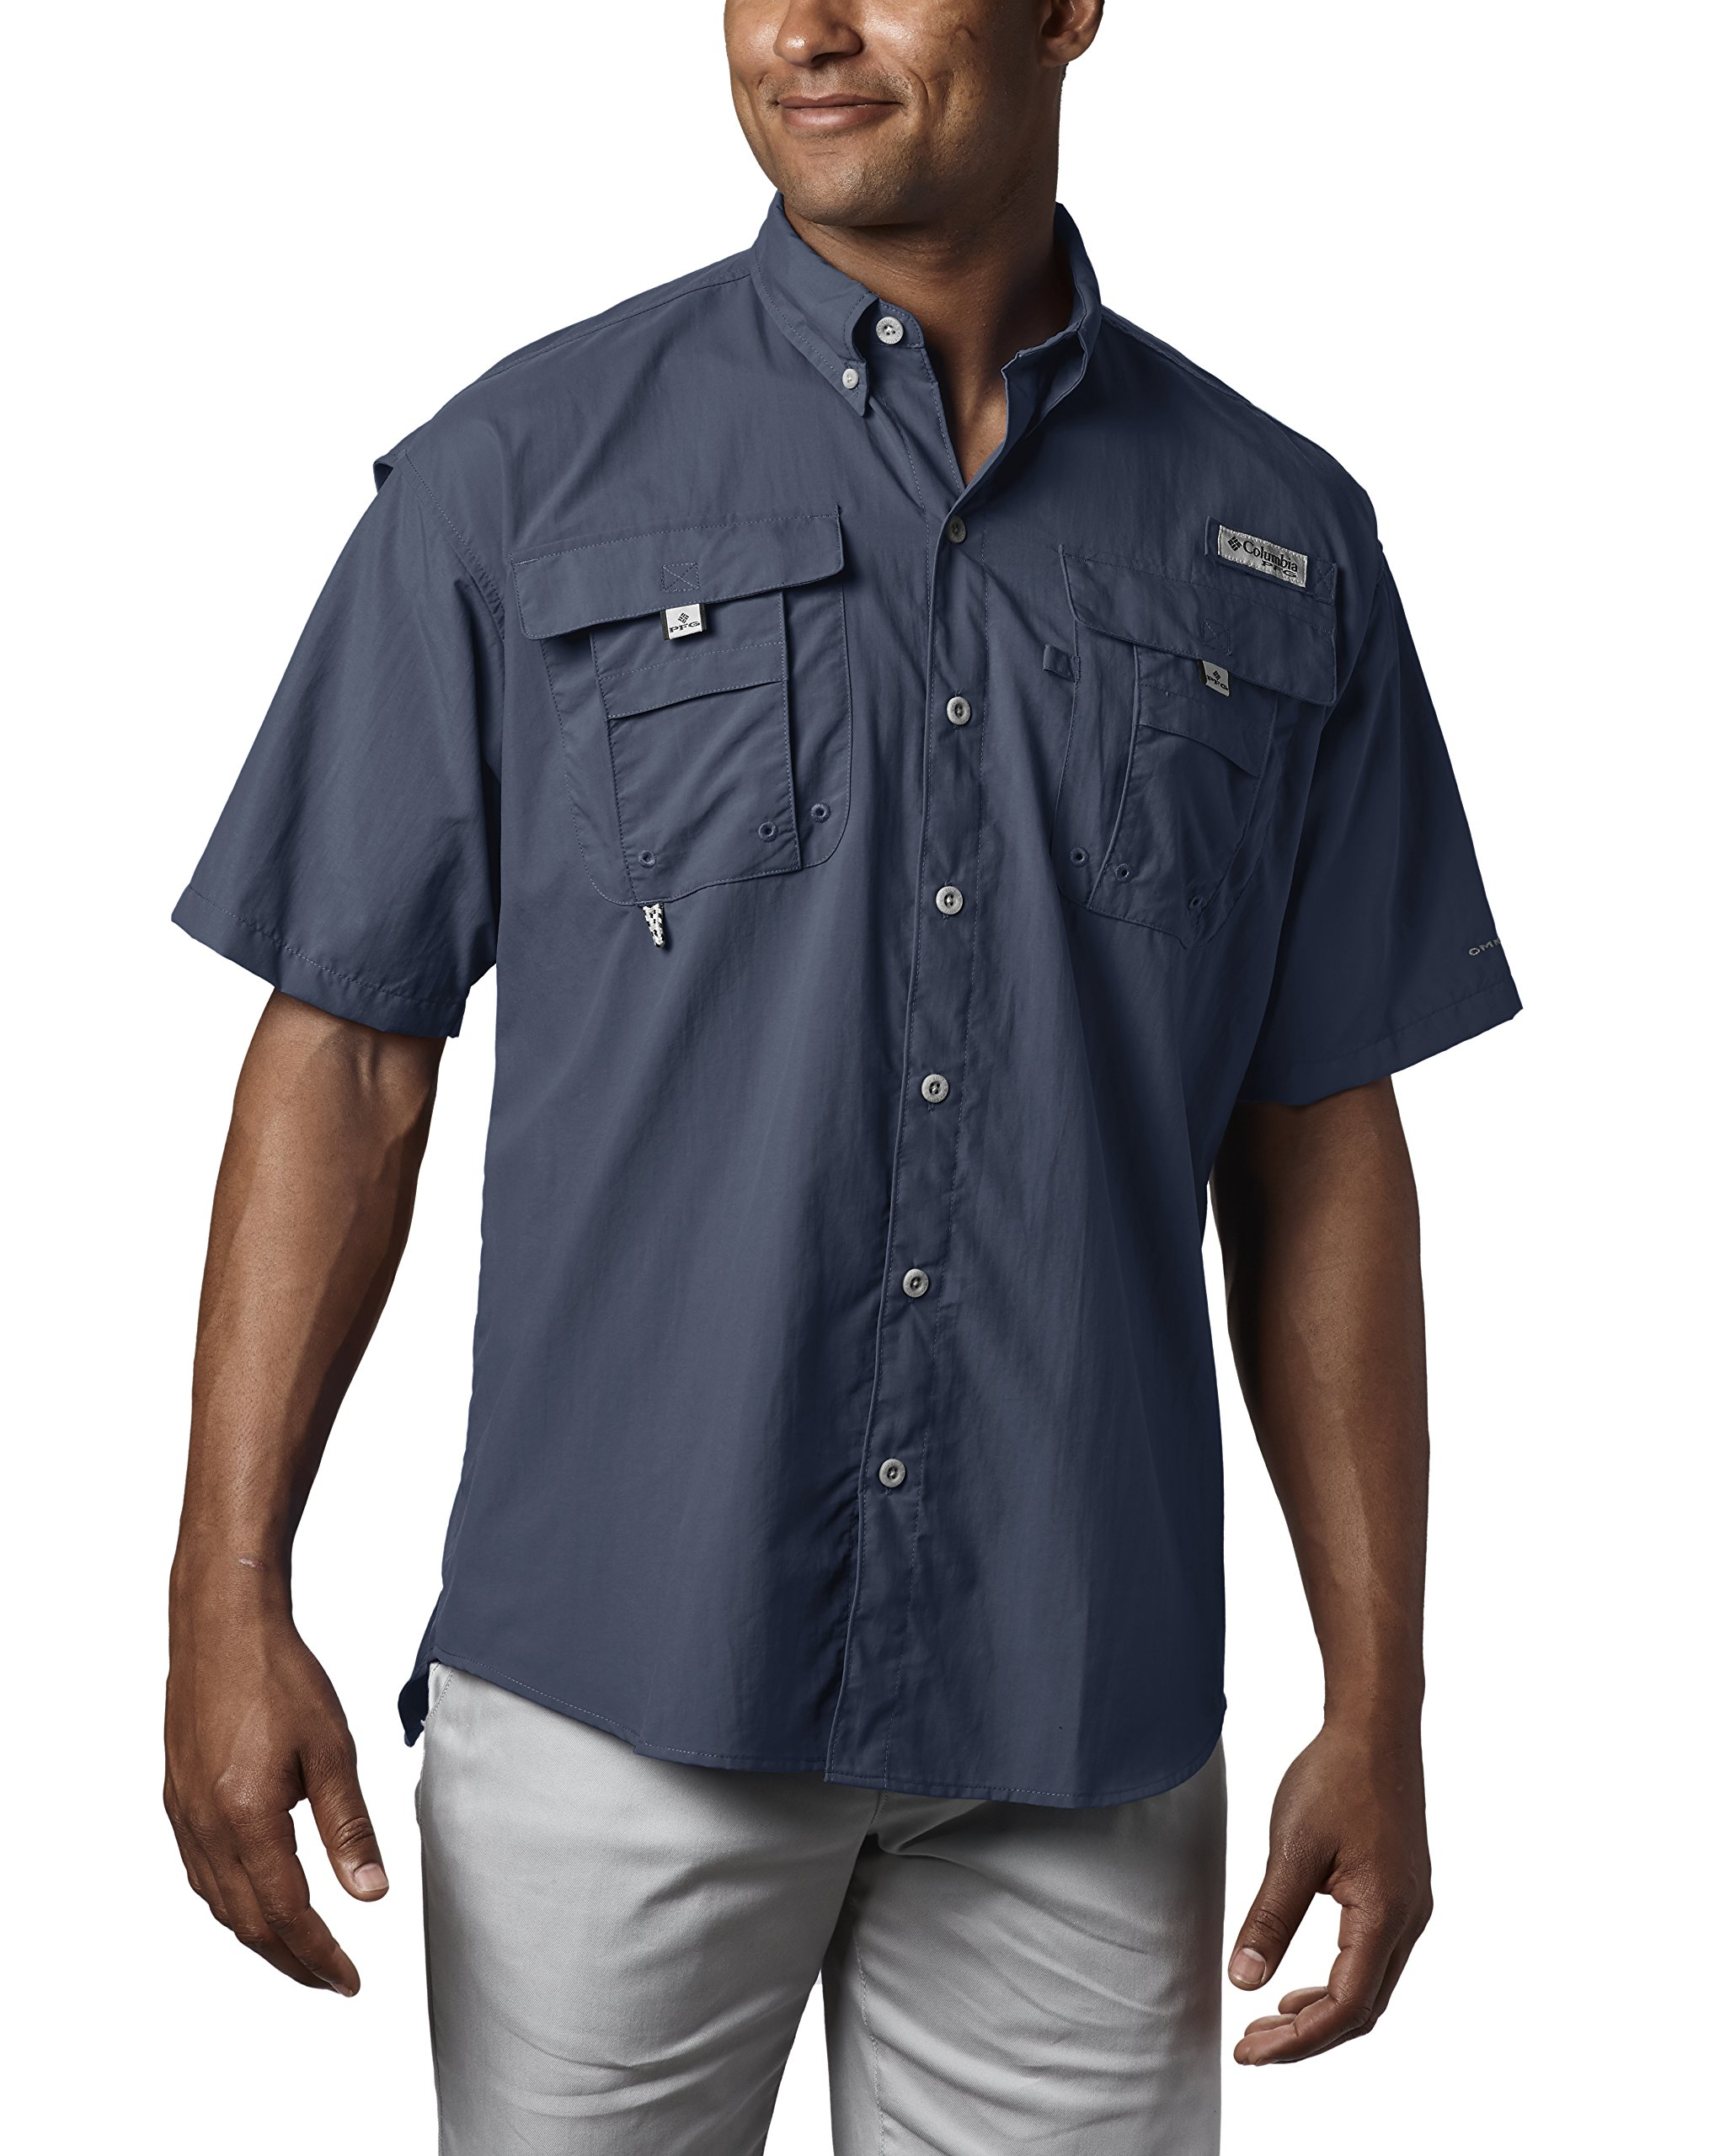 Columbia Men's Bahama II Short Sleeve Shirt, X-Large, Collegiate Navy